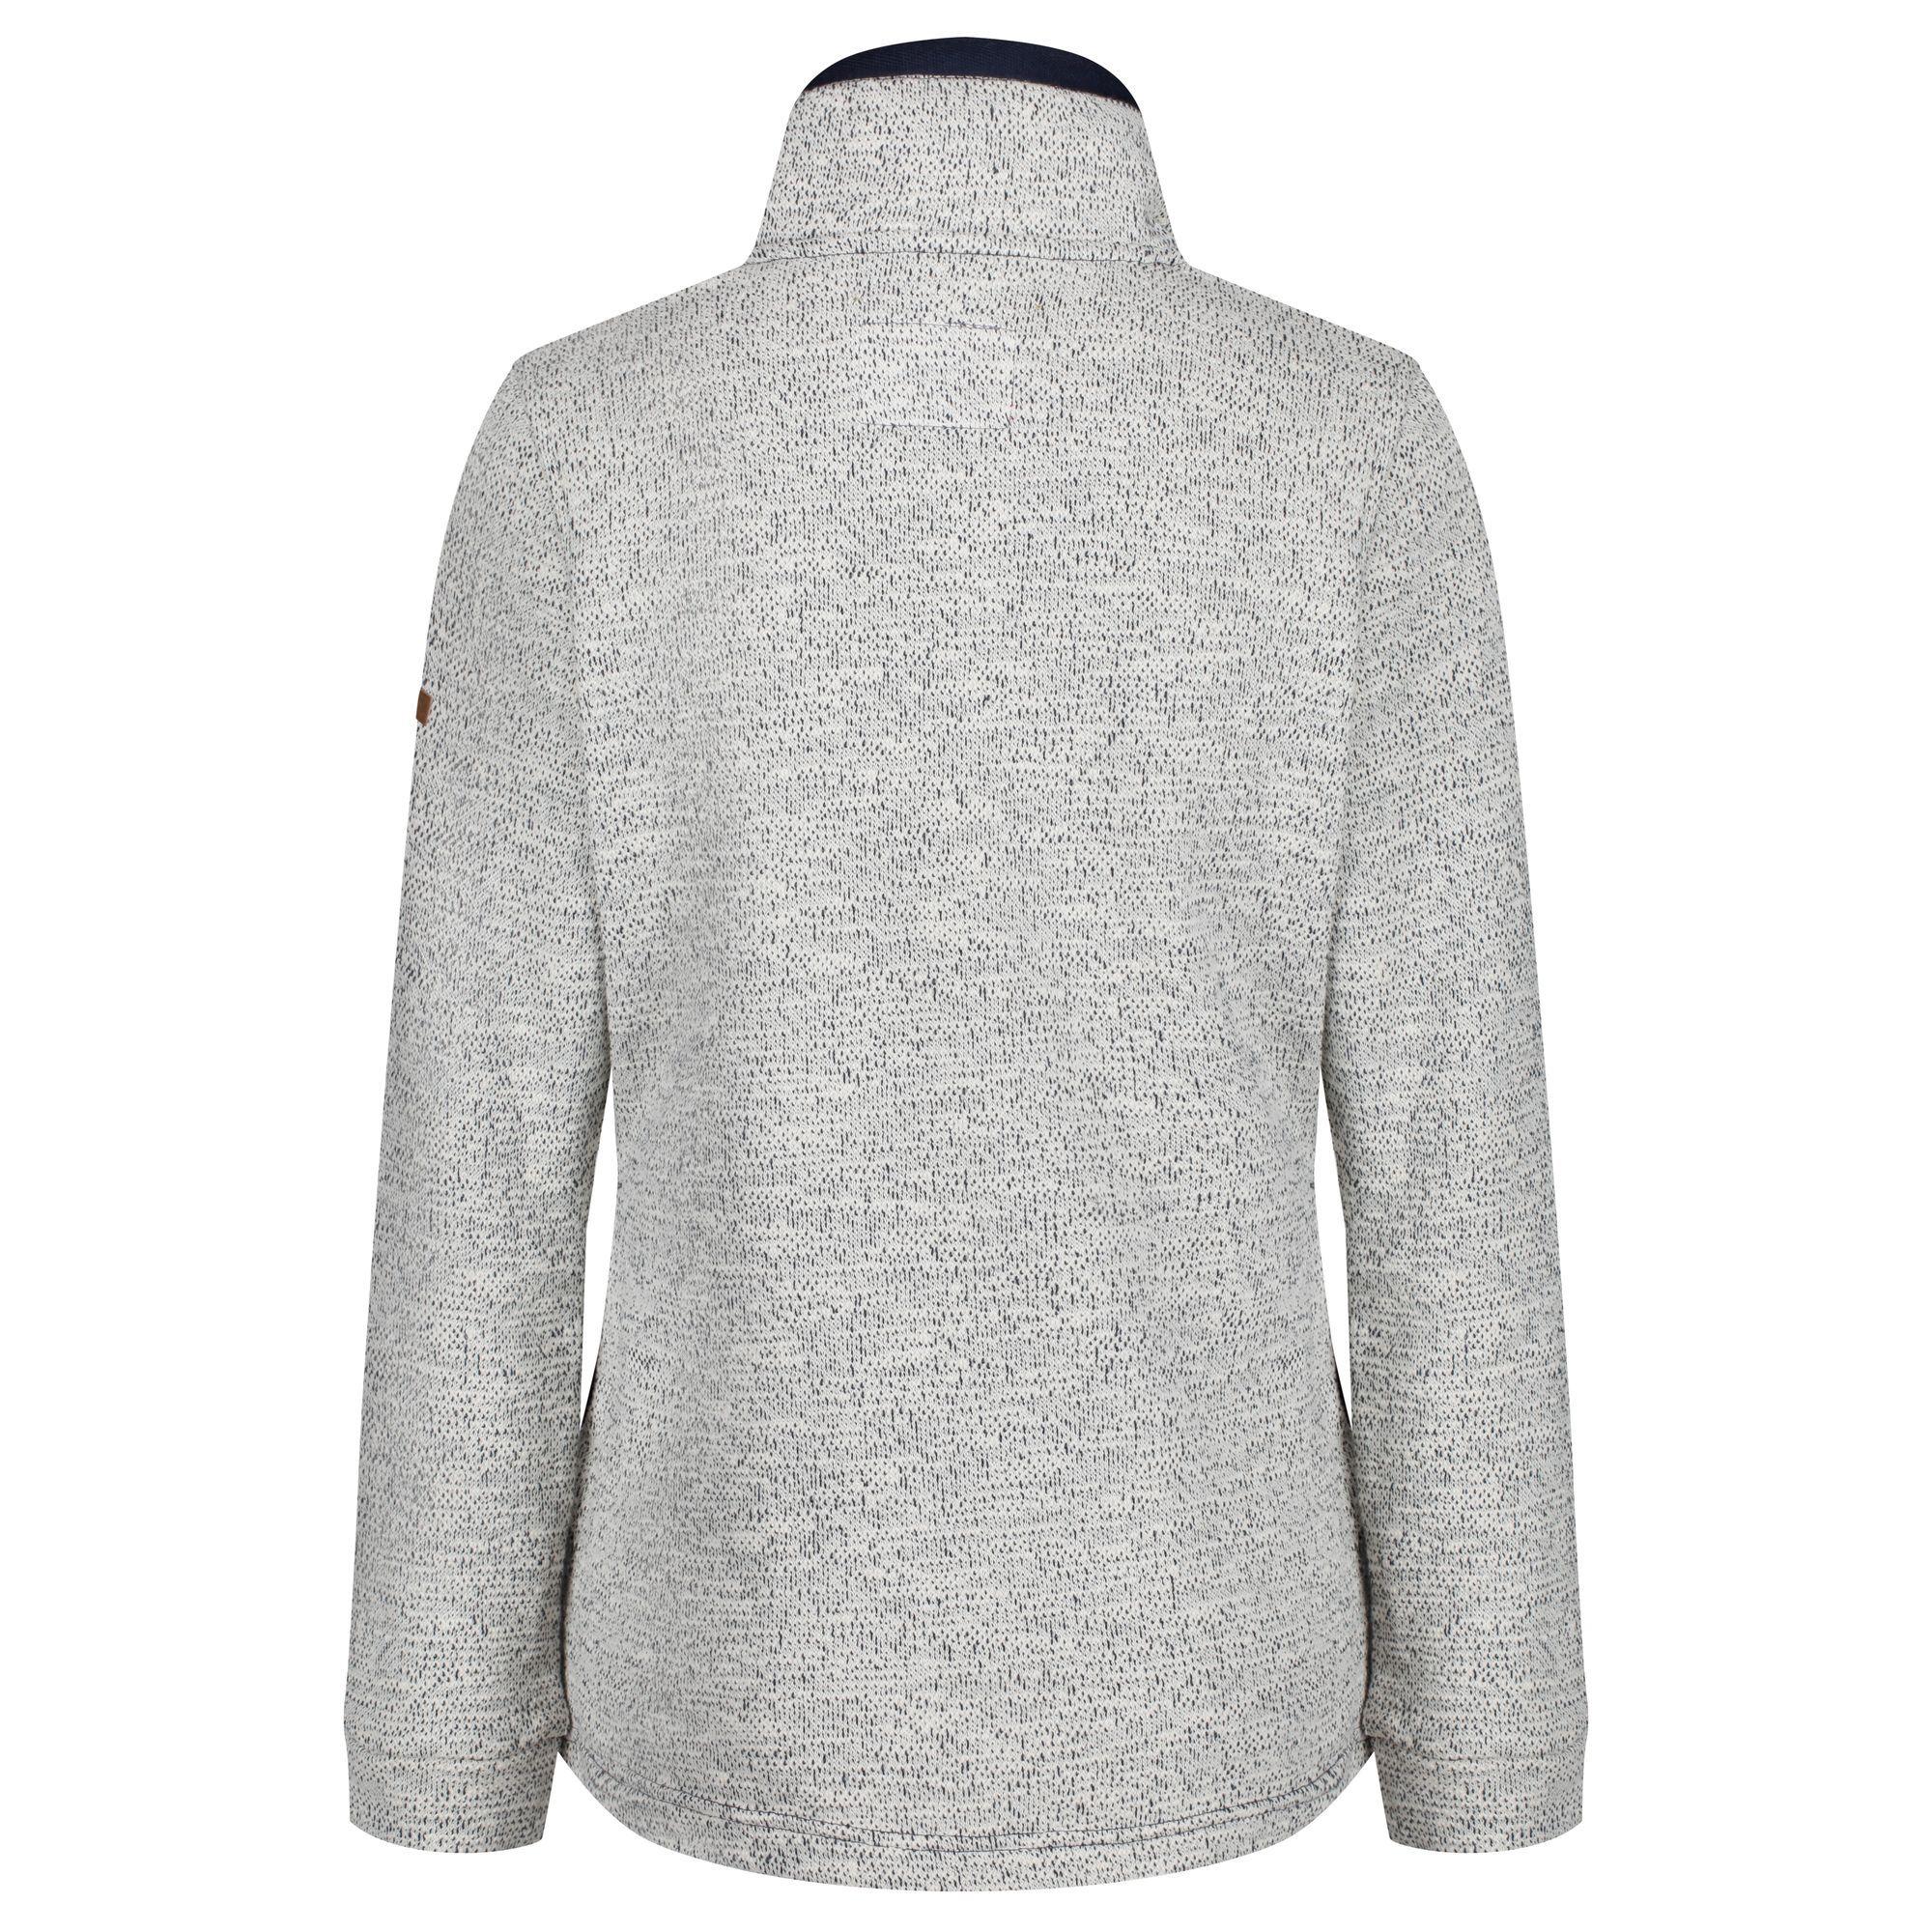 Regatta-Odetta-Womens-Warm-Curved-Full-Zip-Fleece-Jacket-RRP-50 thumbnail 17